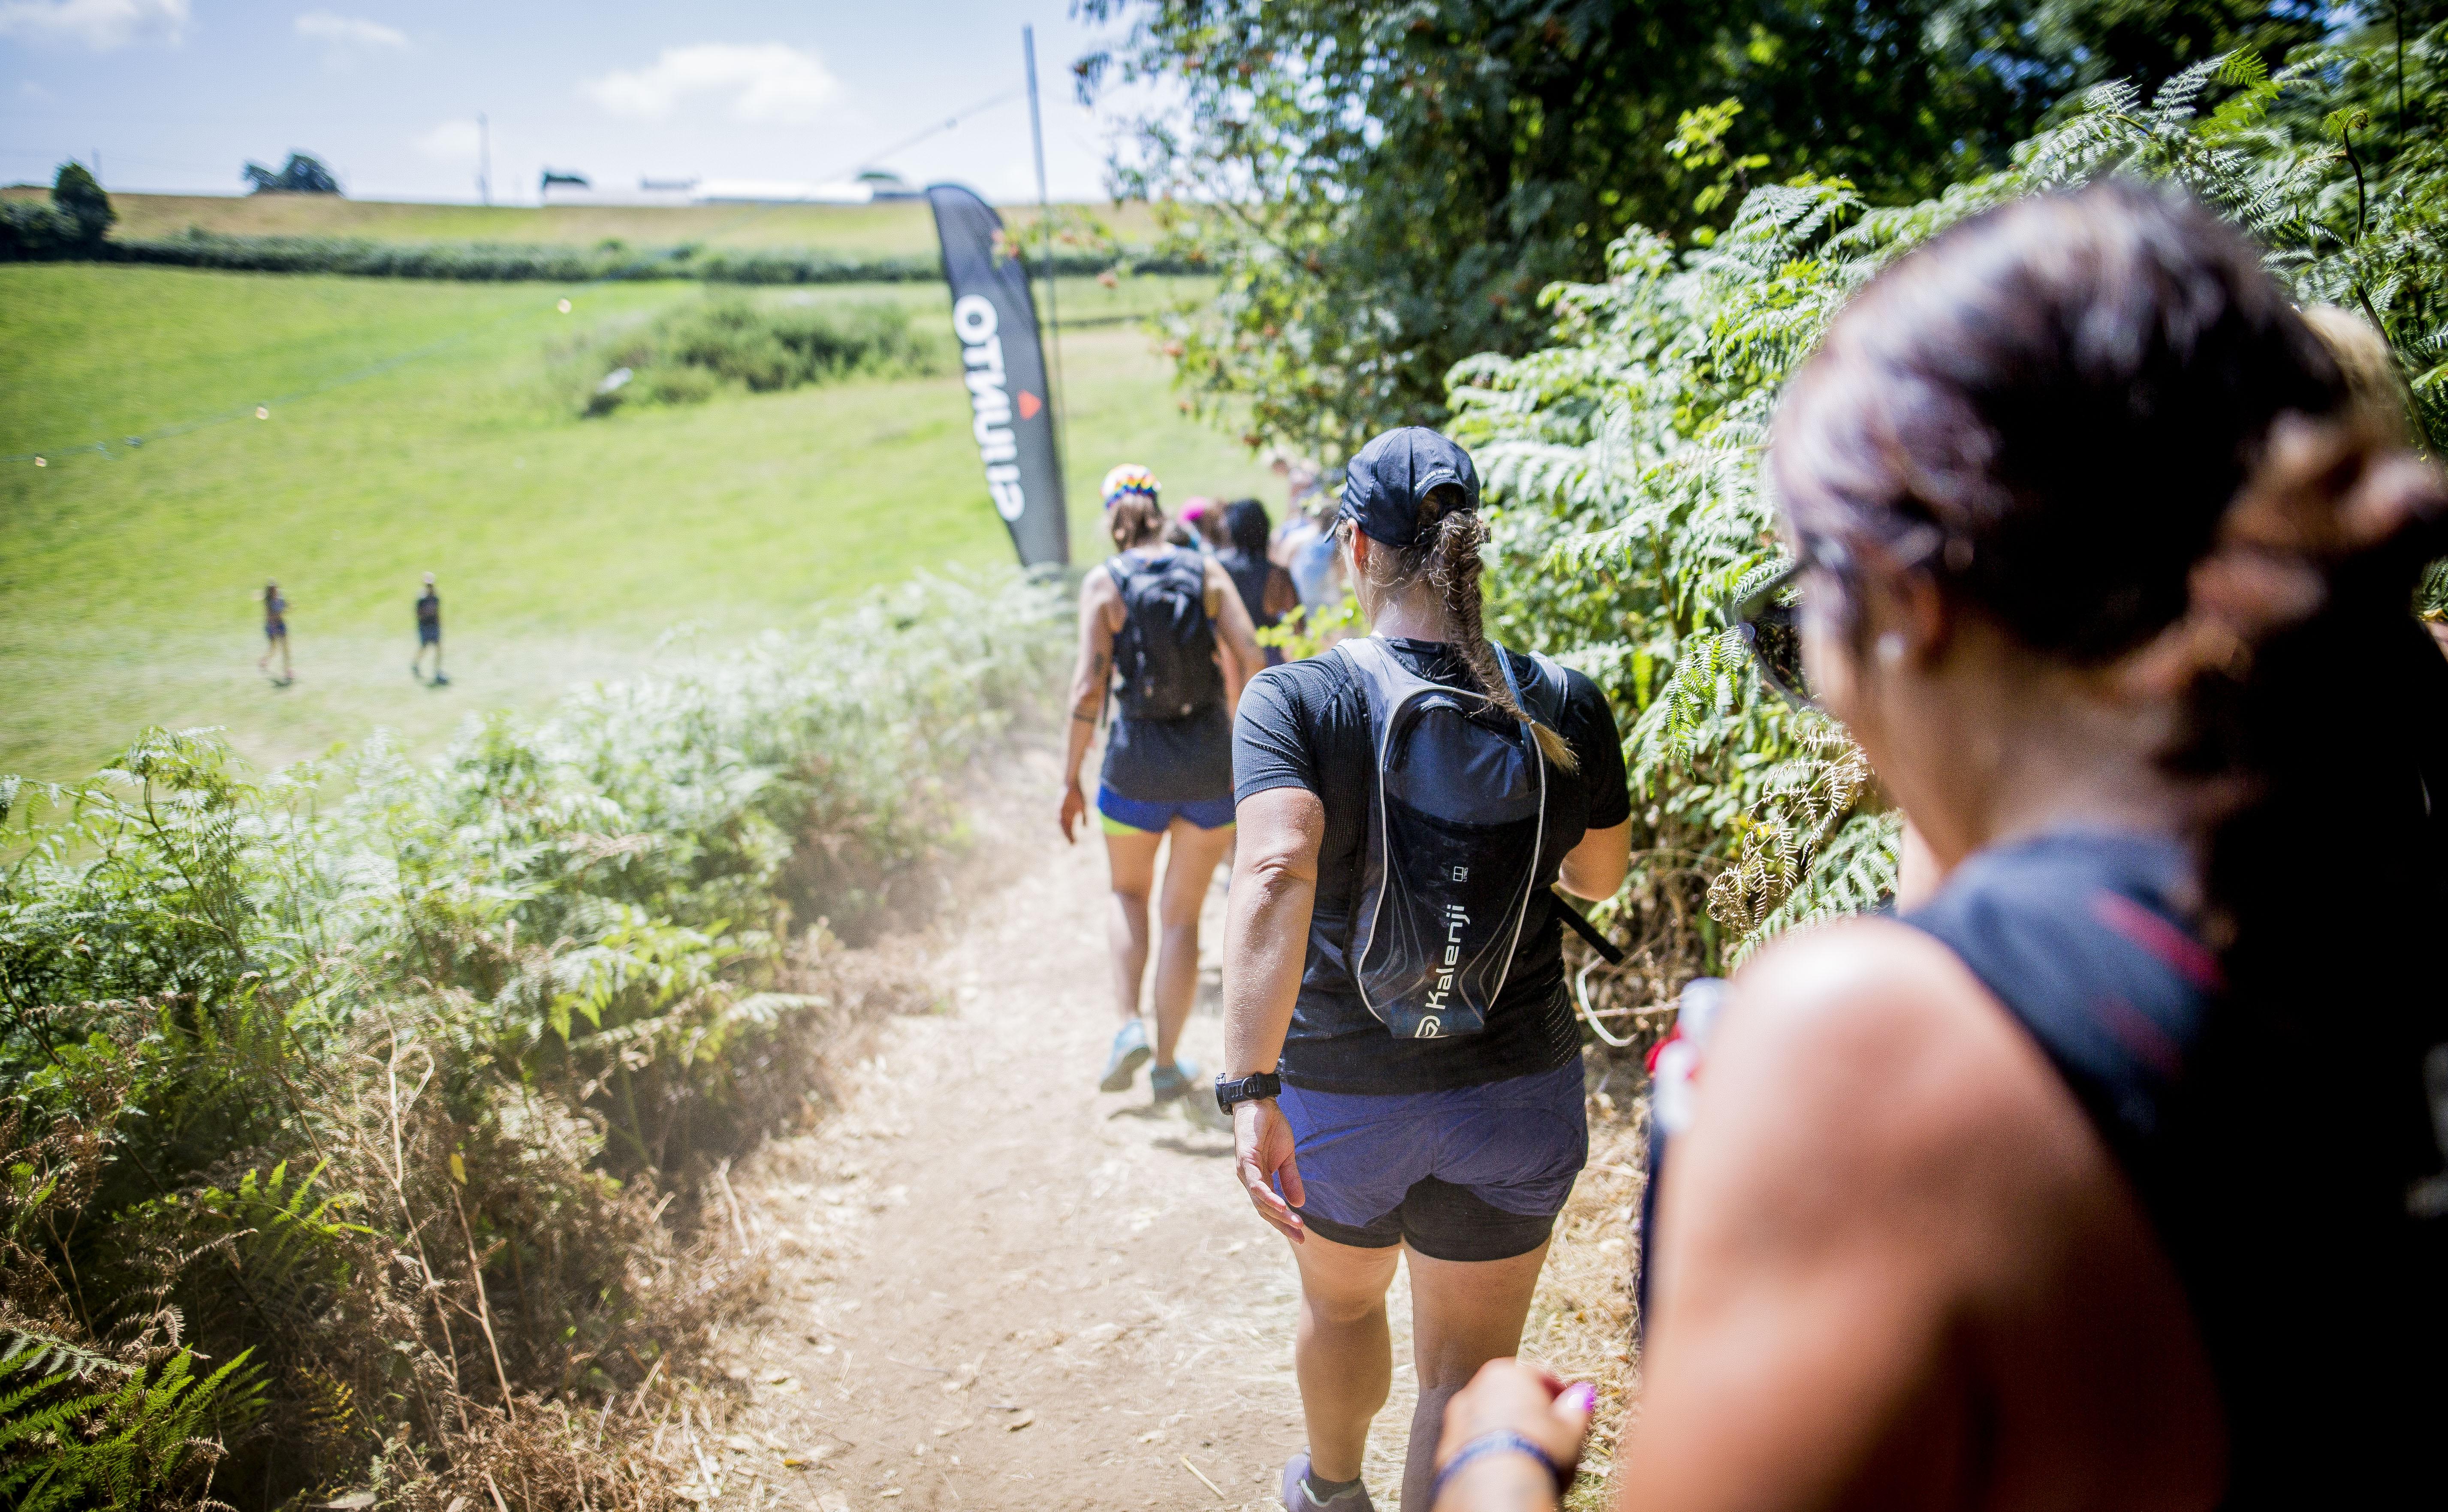 Vivo Barefoot Innovate Sustainability Plogging Run